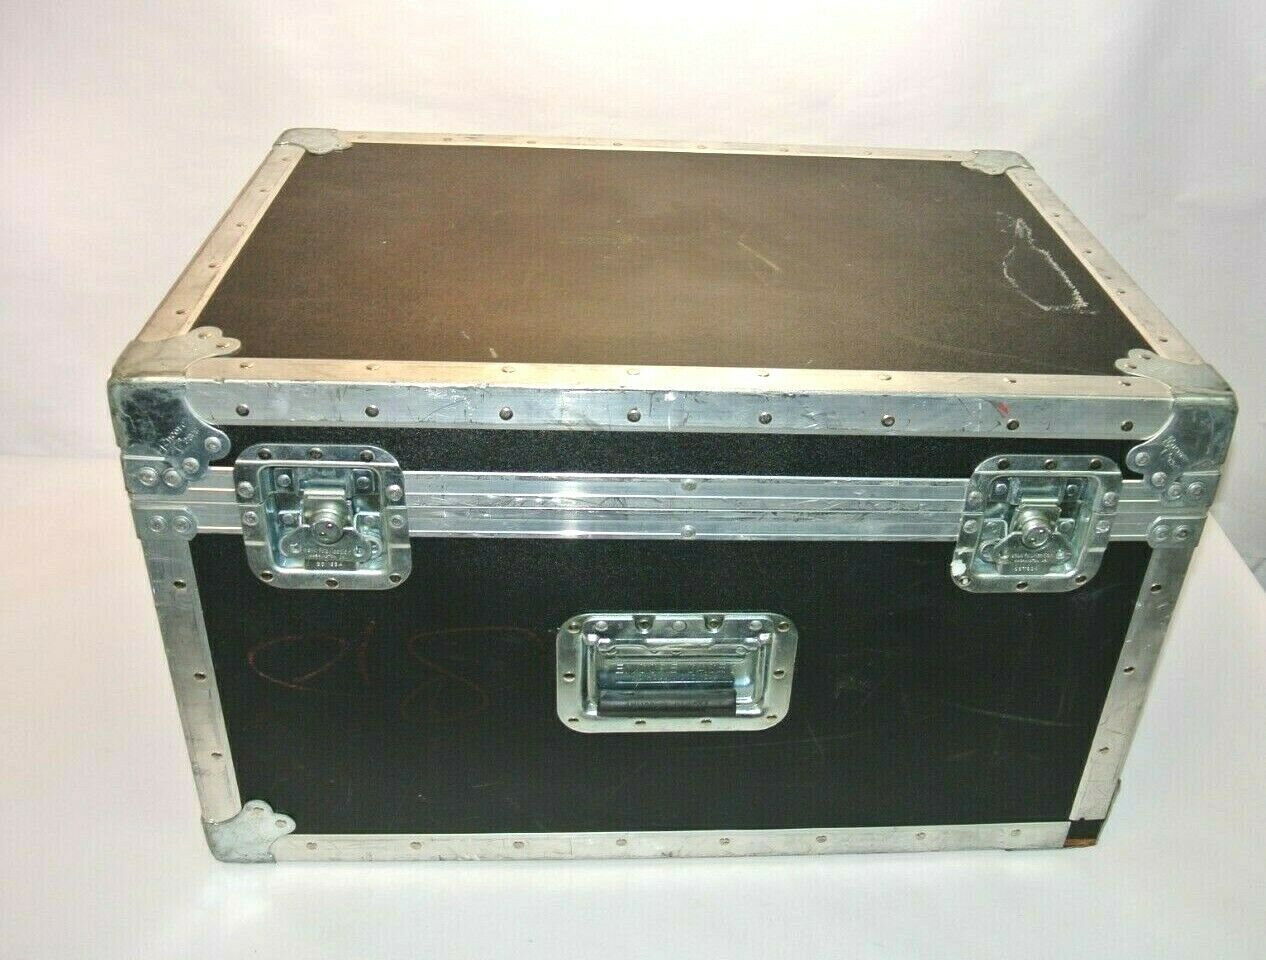 Encore Cases ATA Ground Transport Case Head Amp Case 26.5x18.75x16  OD